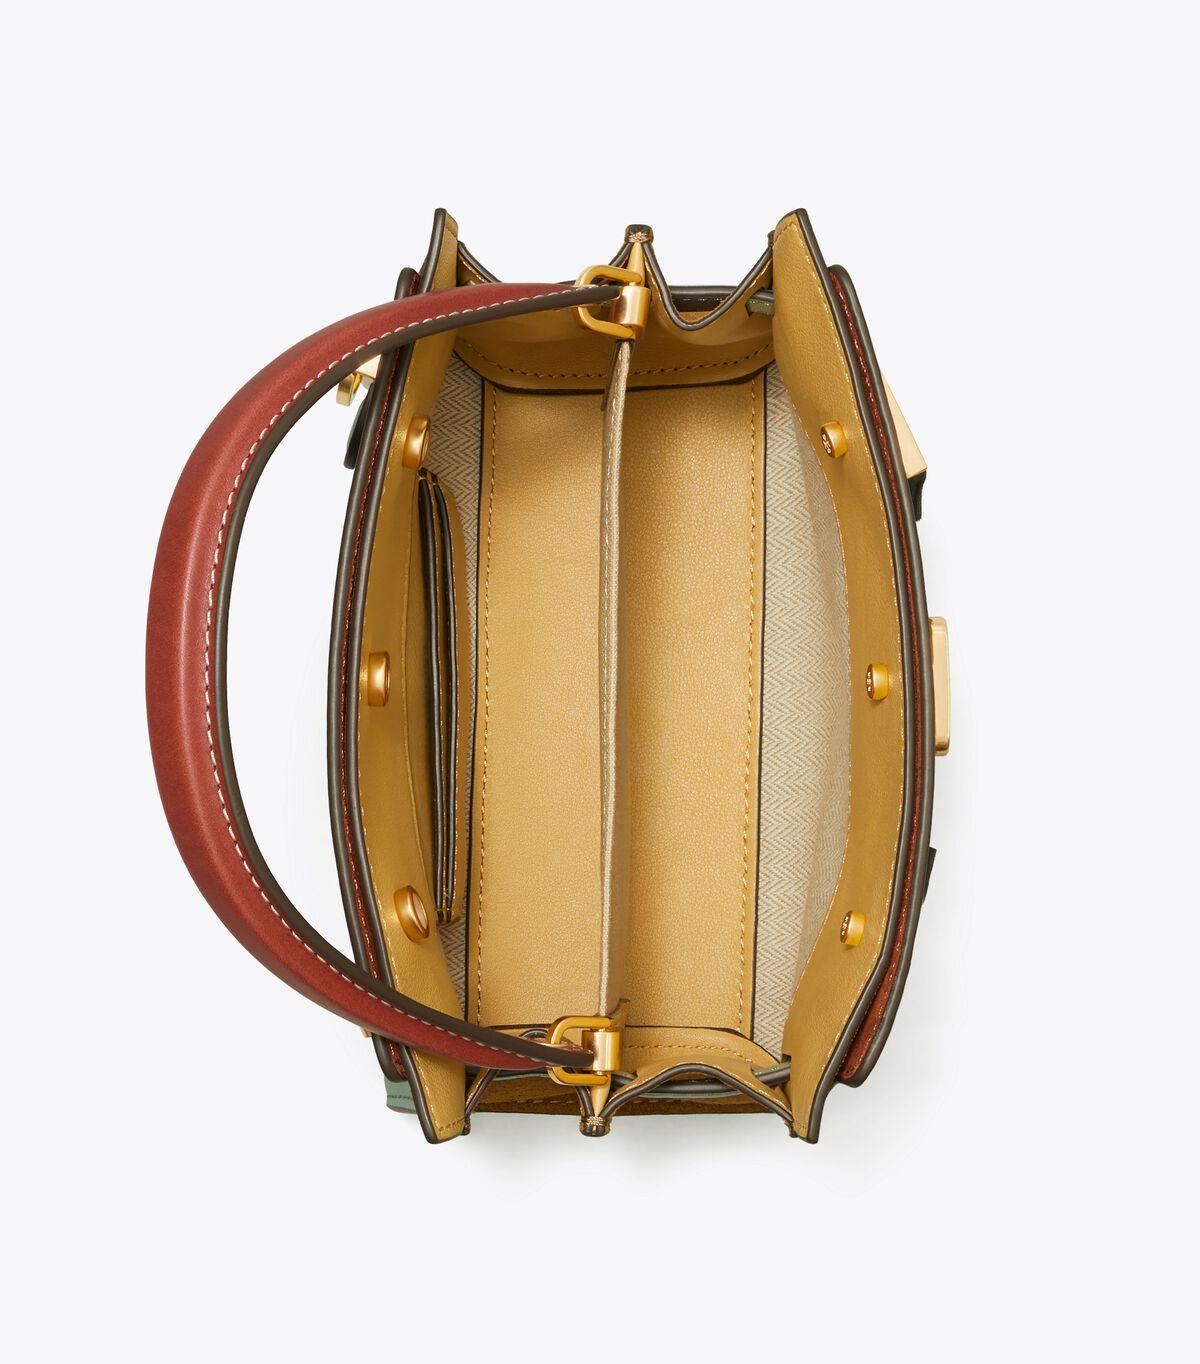 Lee Radziwill Petite Double Bag